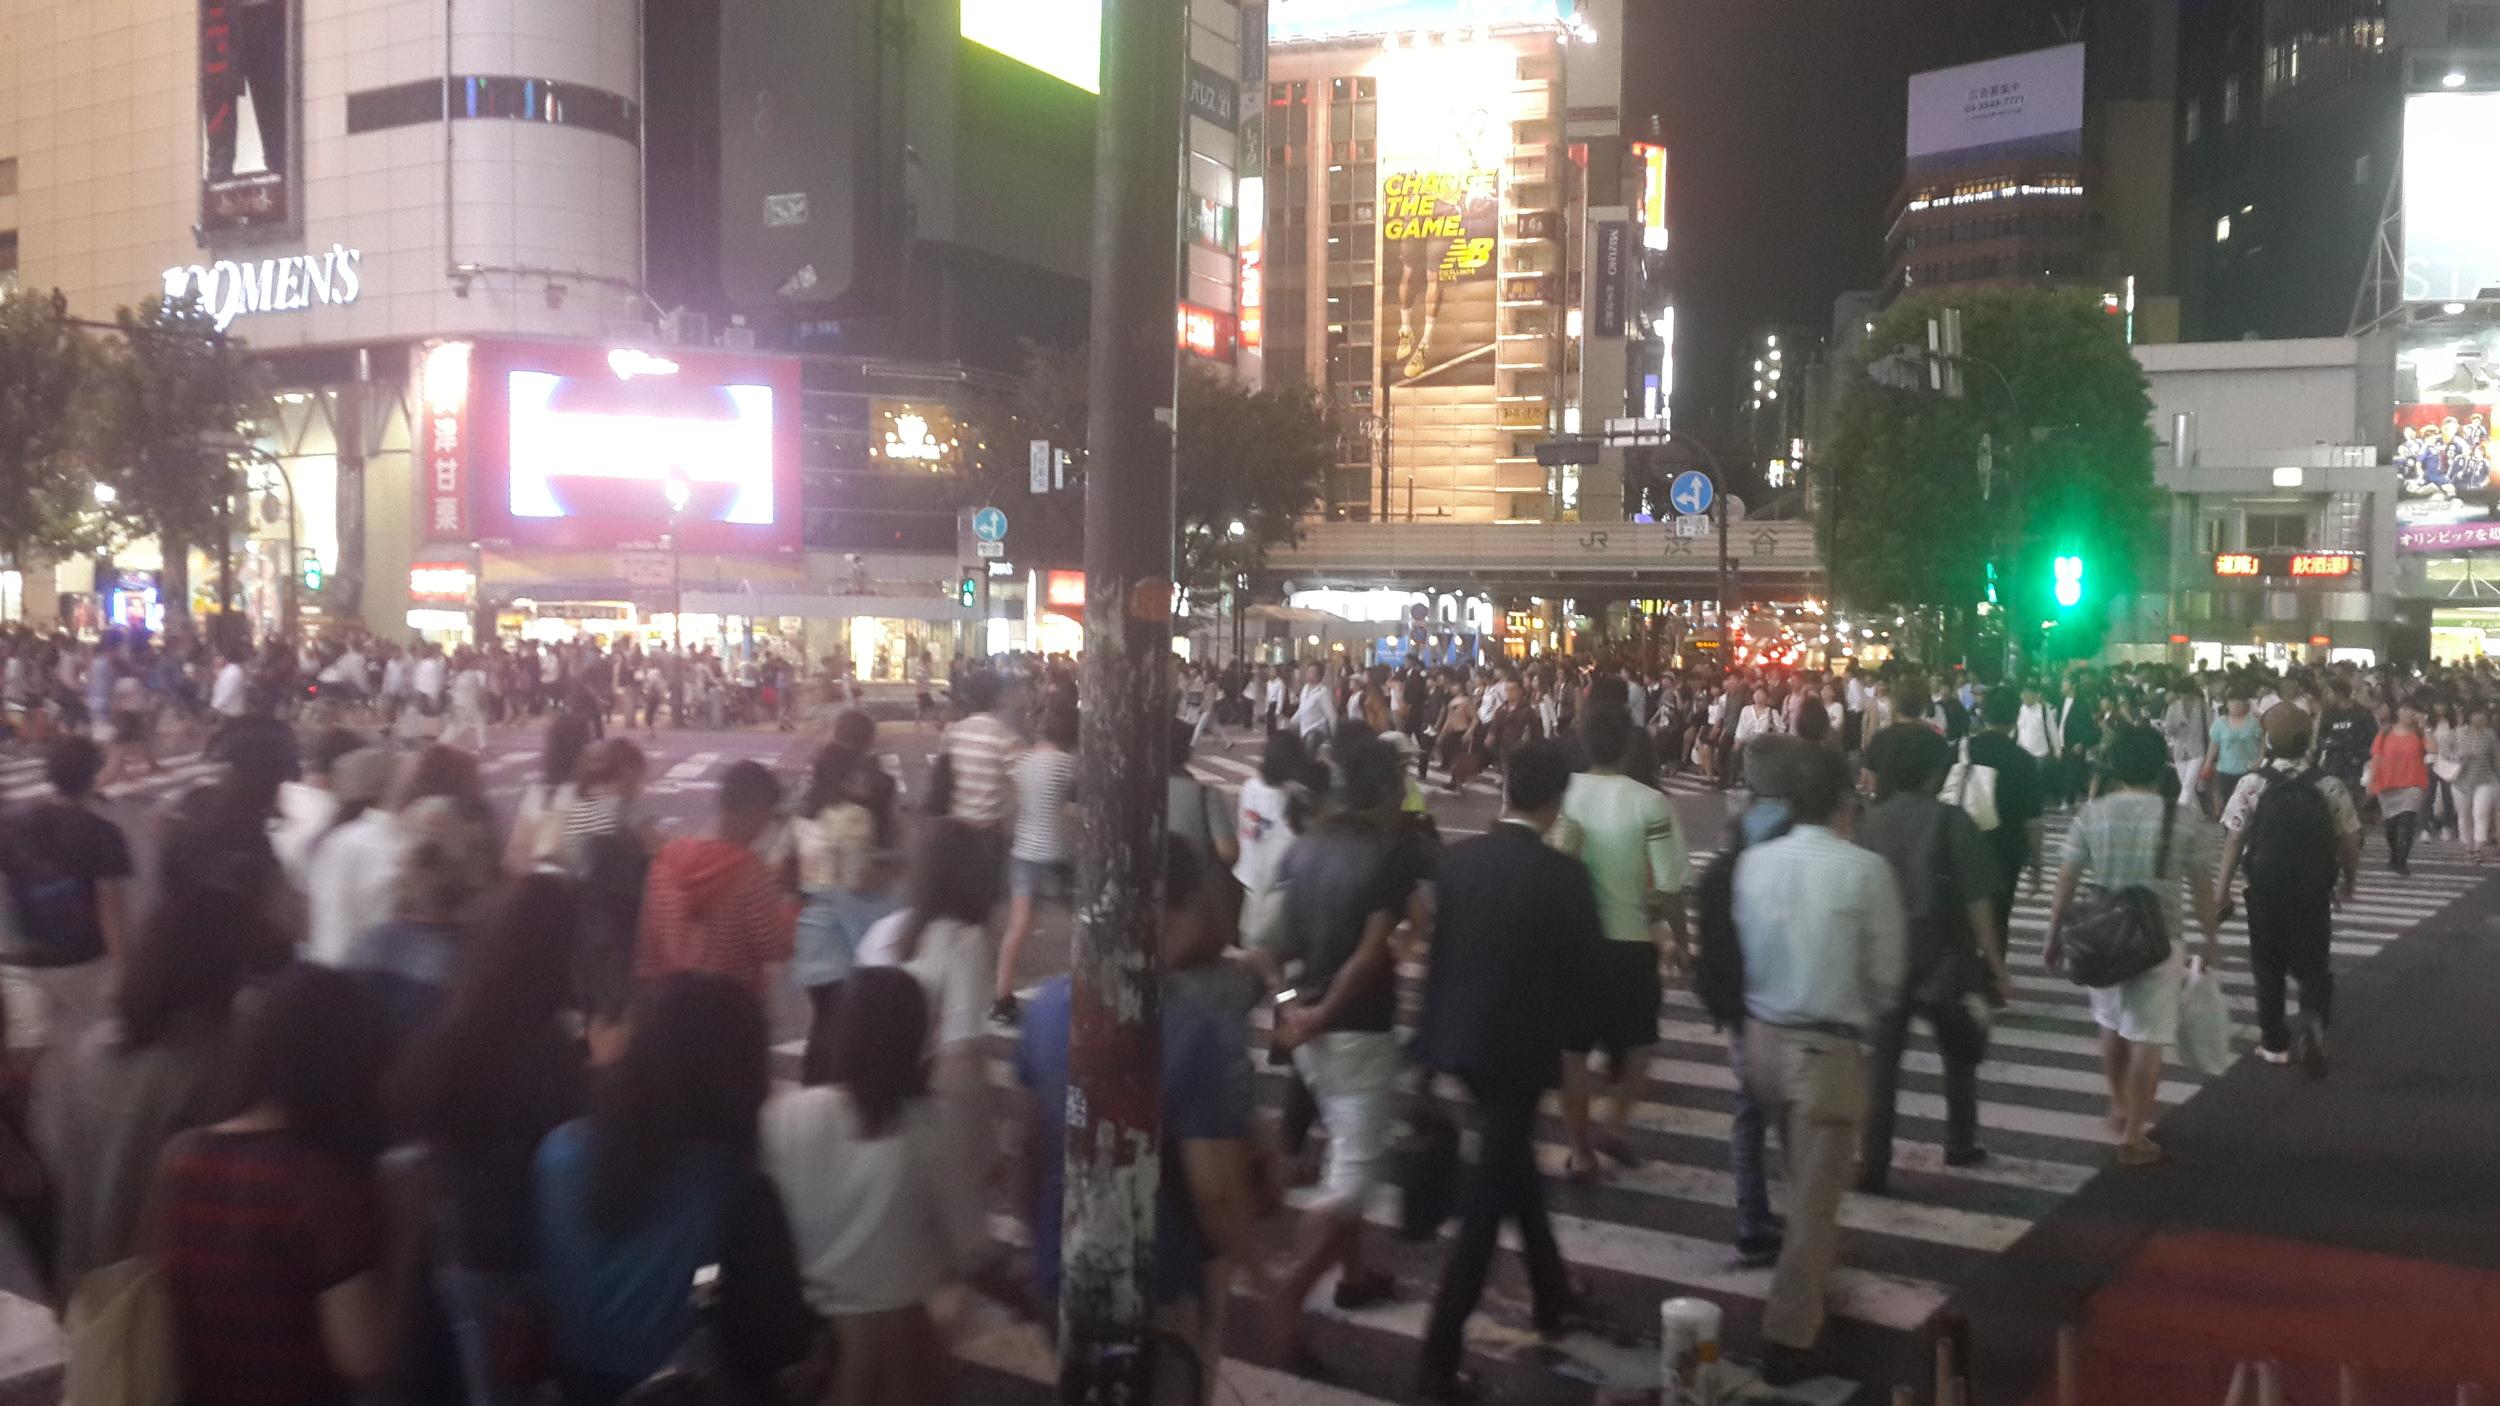 Shibuya, world's largest pedestrian crossing